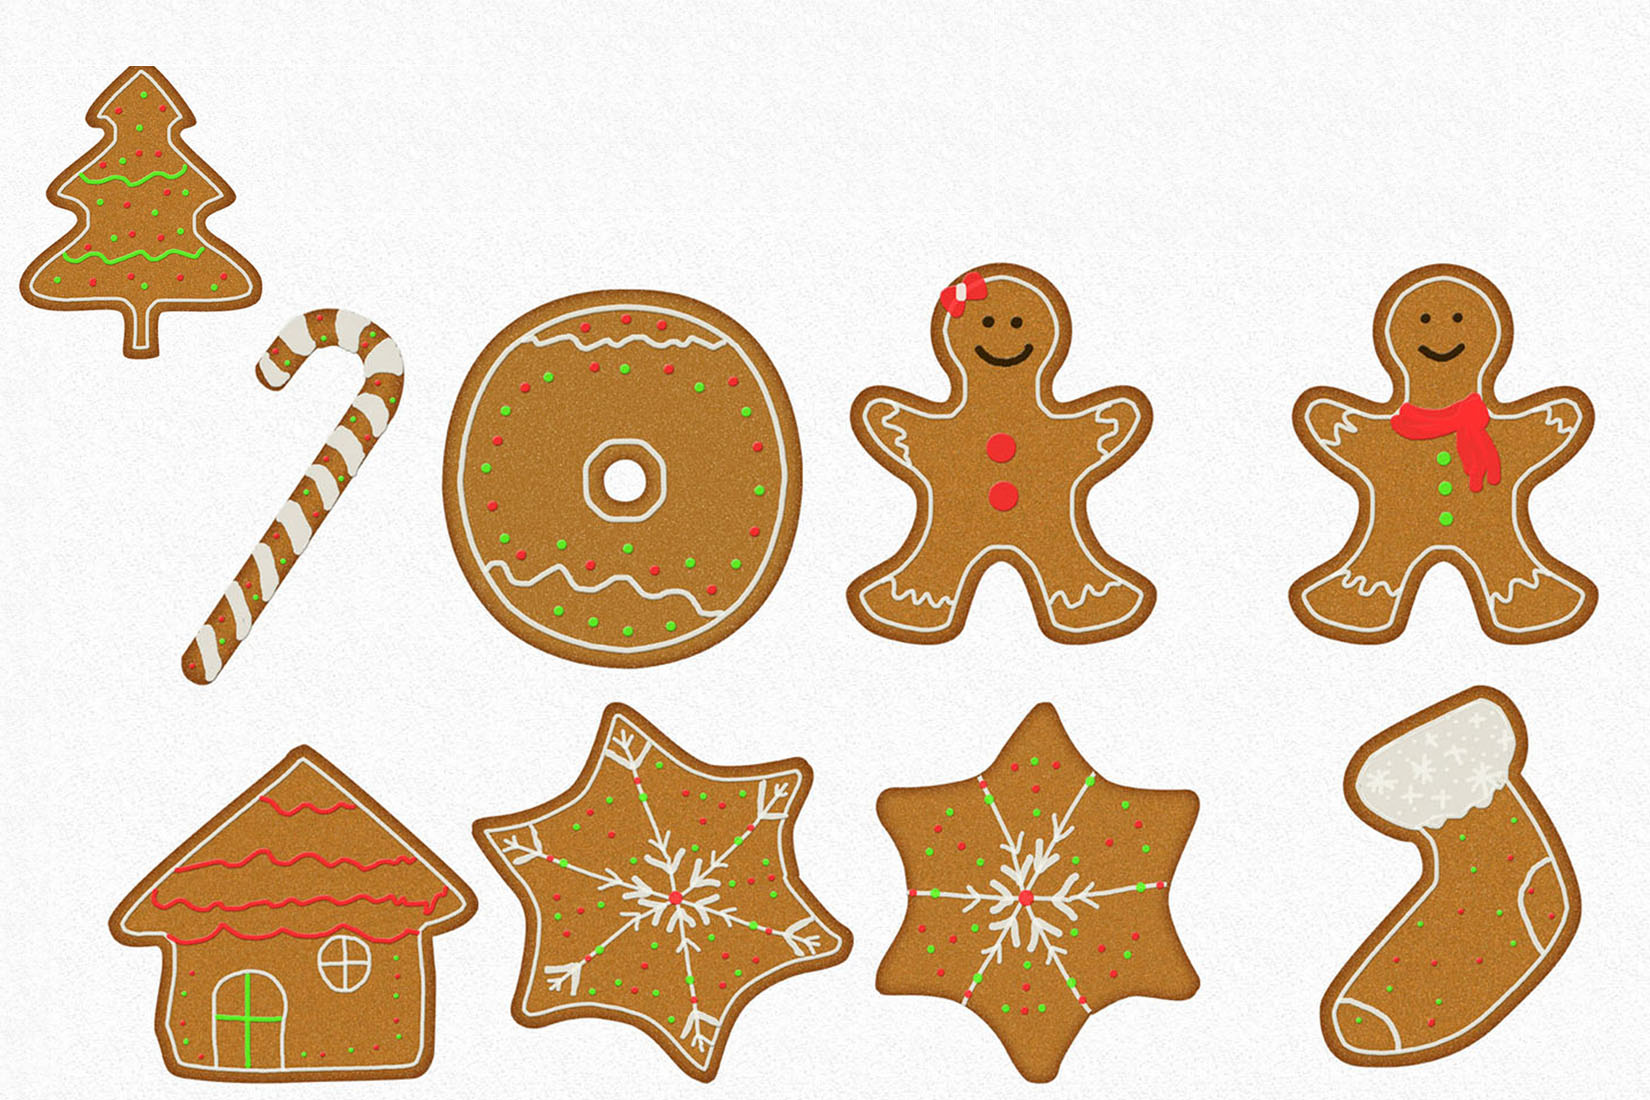 Gingerman Design Bundle - Letters, Numbers, Illustrations example image 7